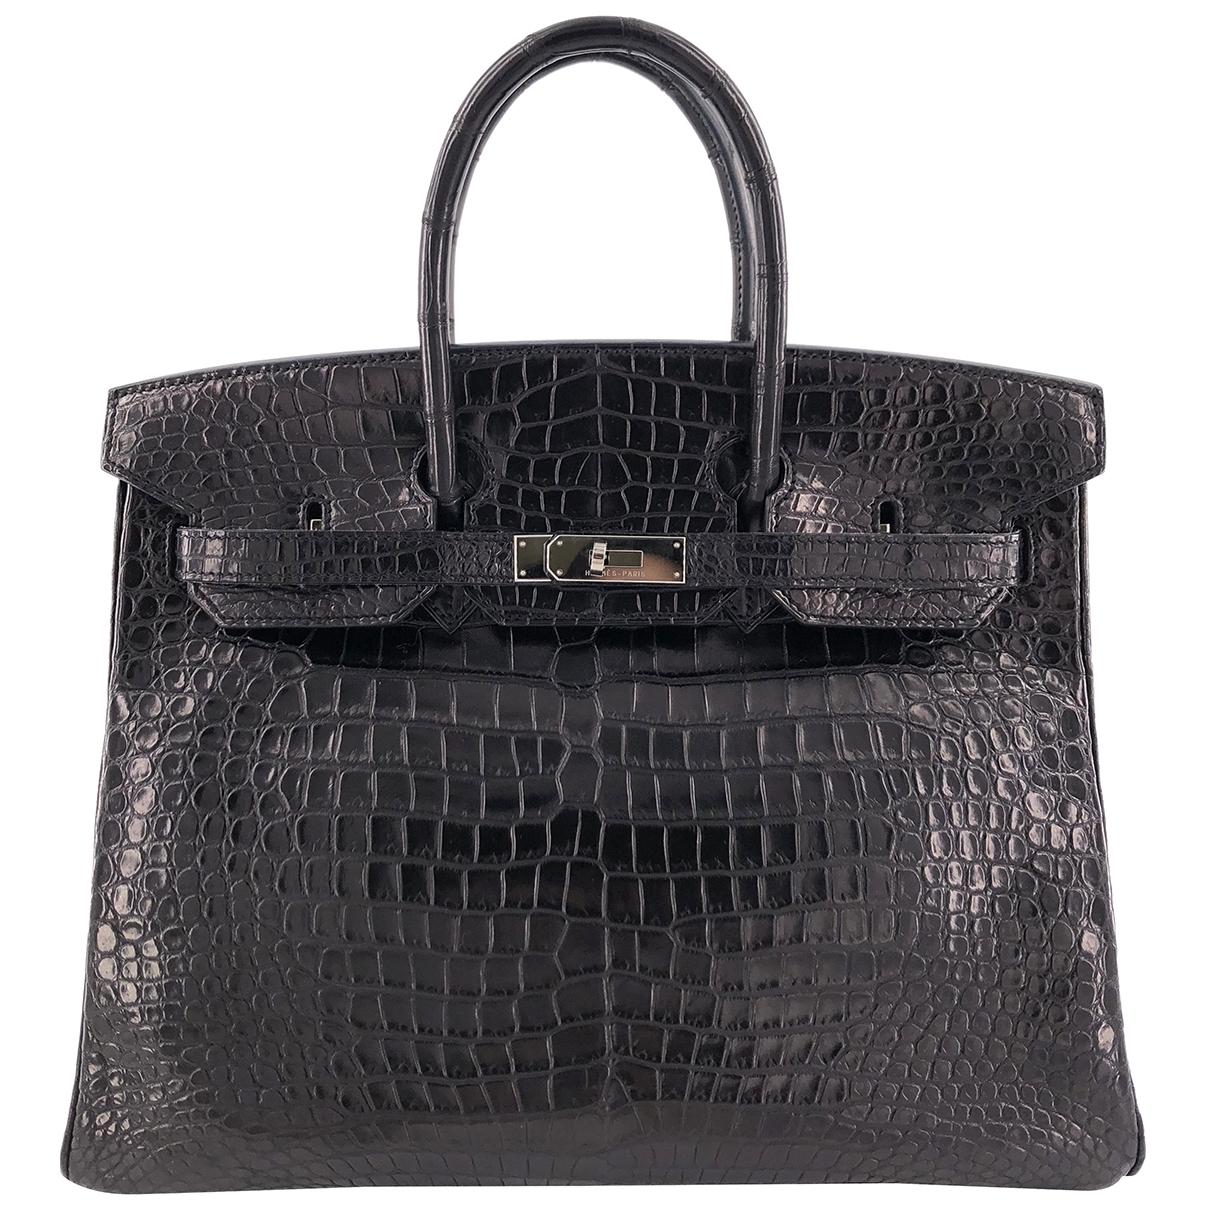 Hermes Birkin 35 Handtasche in  Schwarz Krokodil